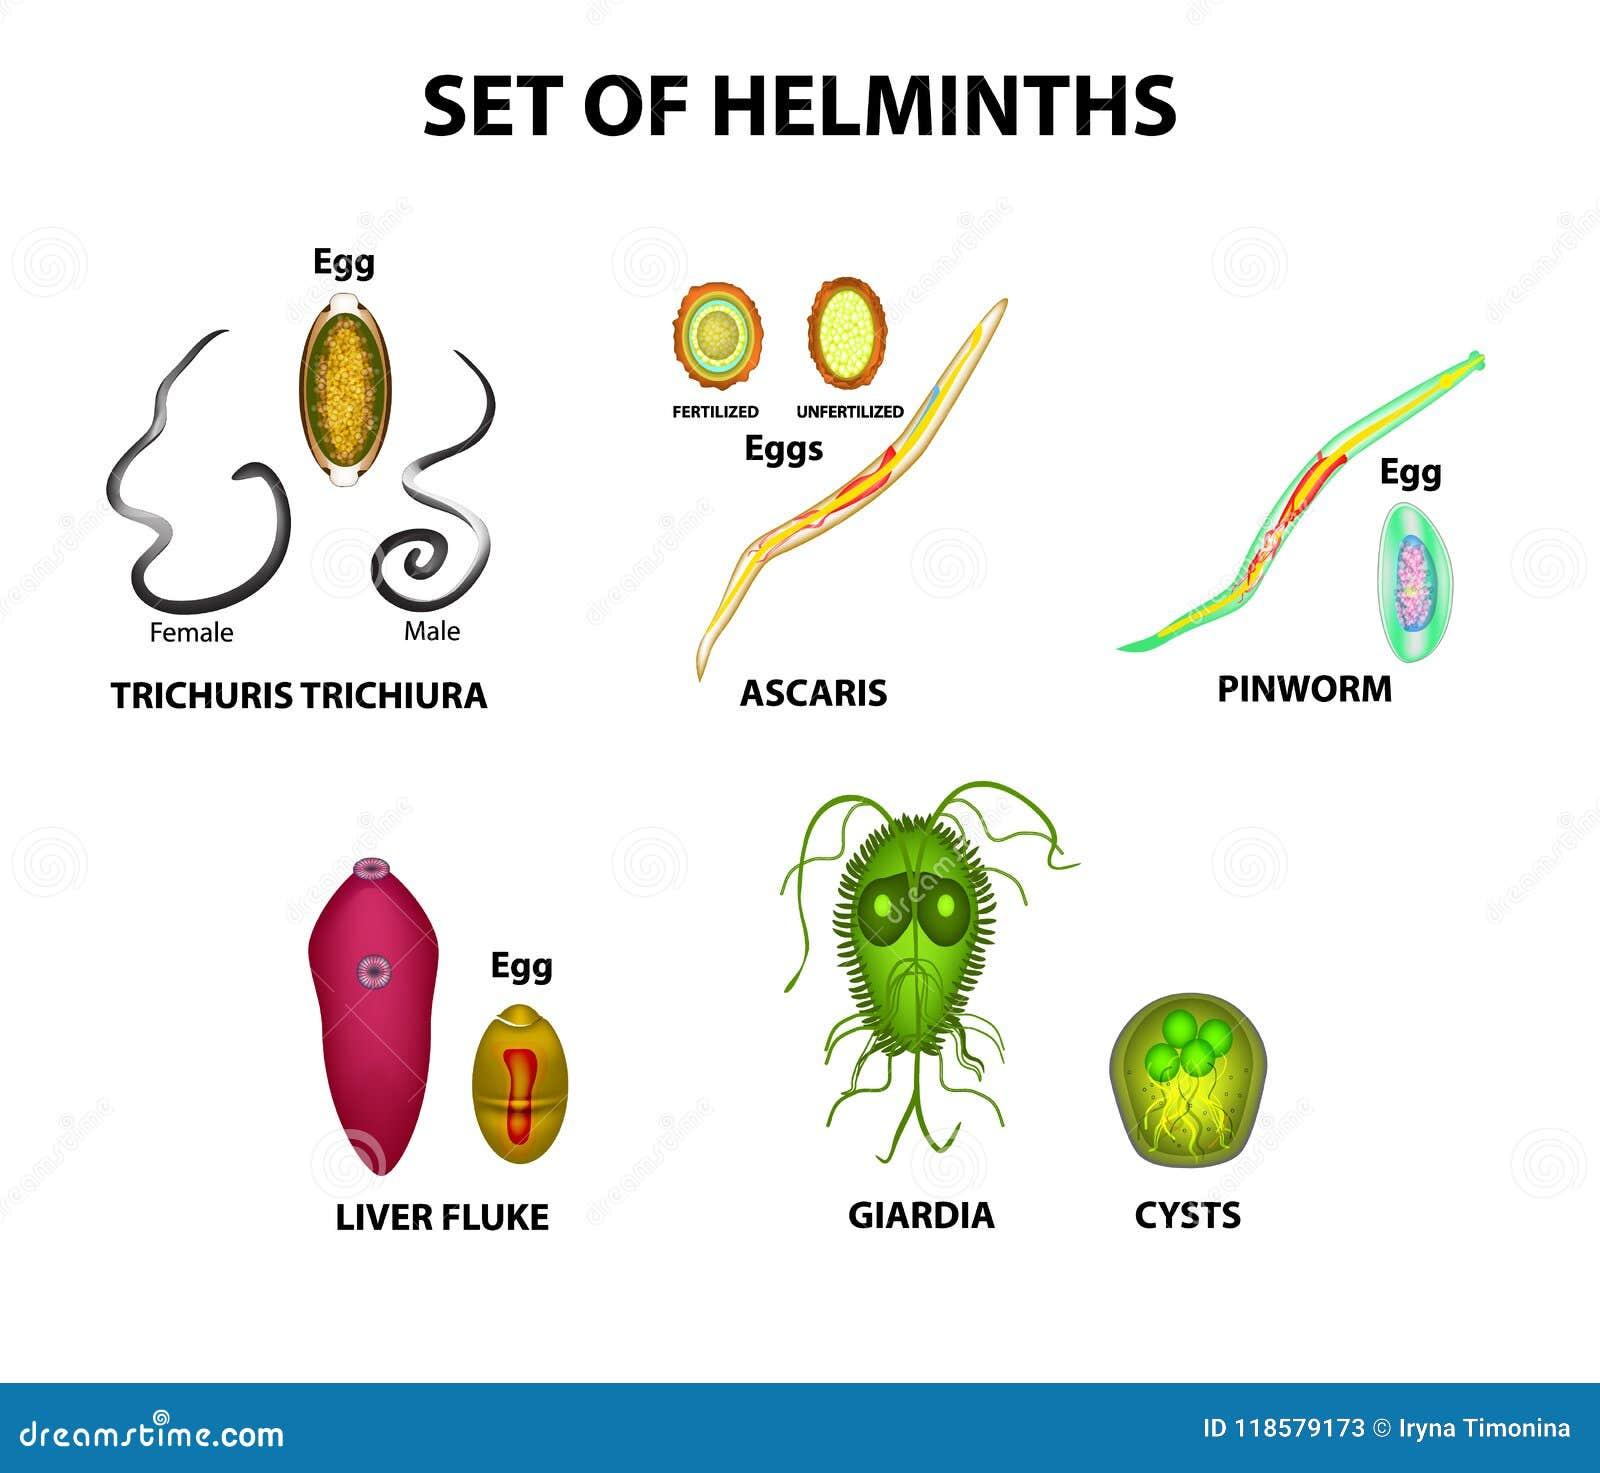 squamous papilloma vs wart redoxon vitamina c ingredientes